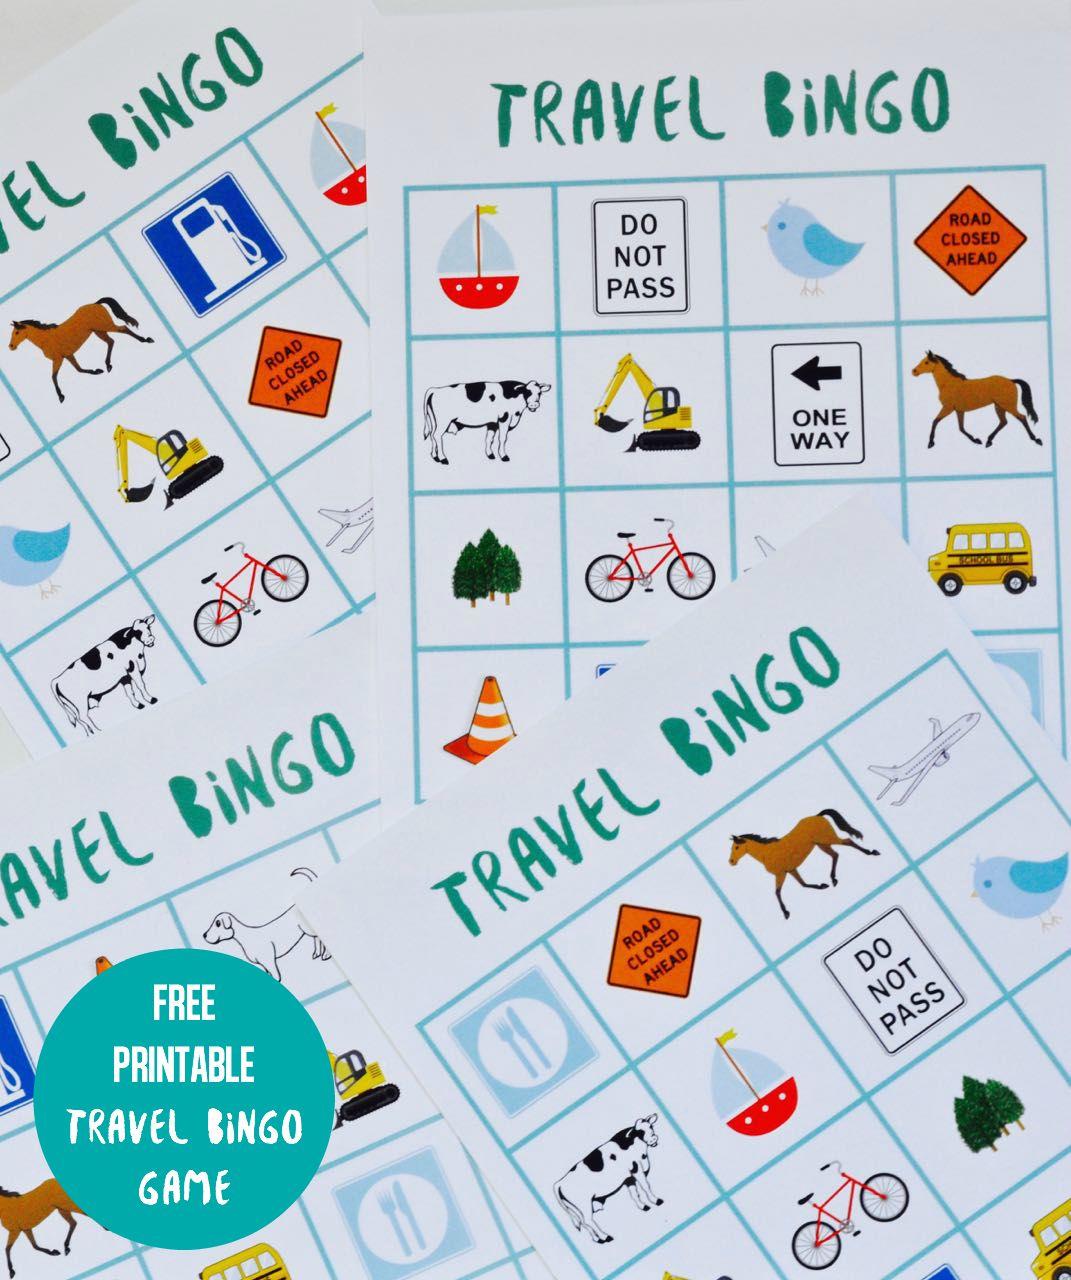 Free Printable Travel Bingo Game - Make Life Lovely